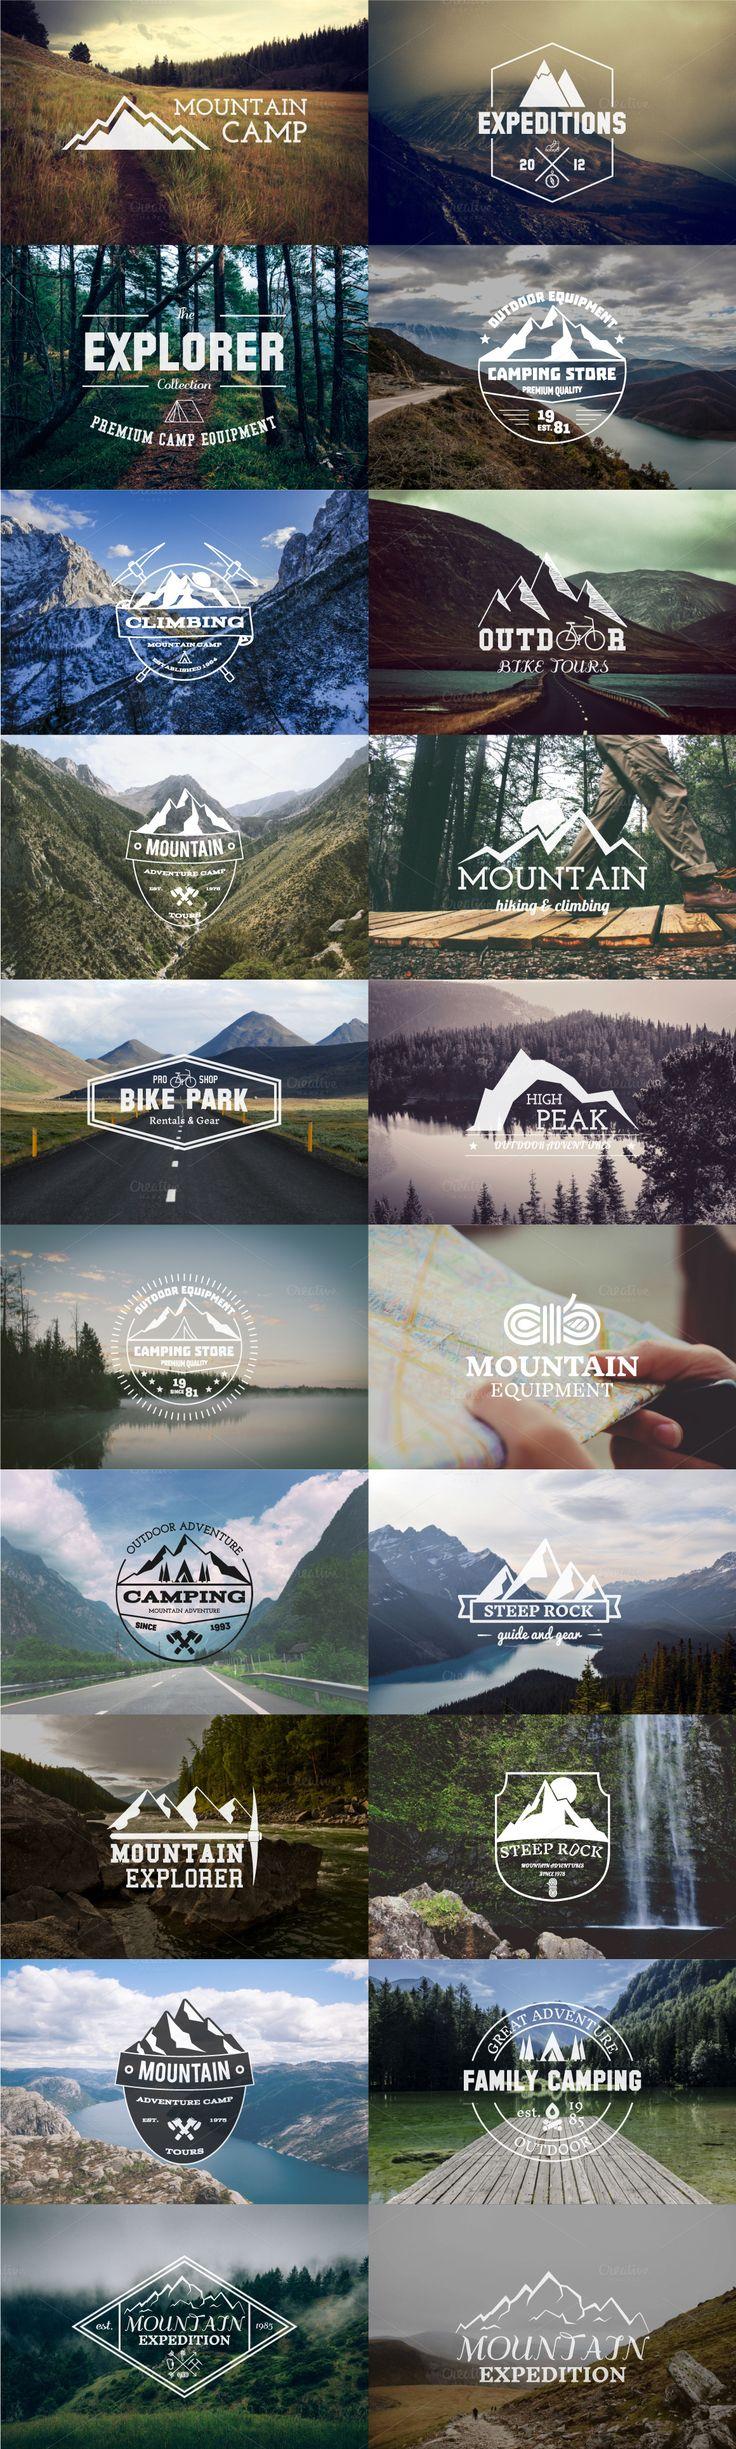 20 Adventure Badges & Logos #design Download: https://creativemarket.com/JeksonJS/342371?u=ksioks